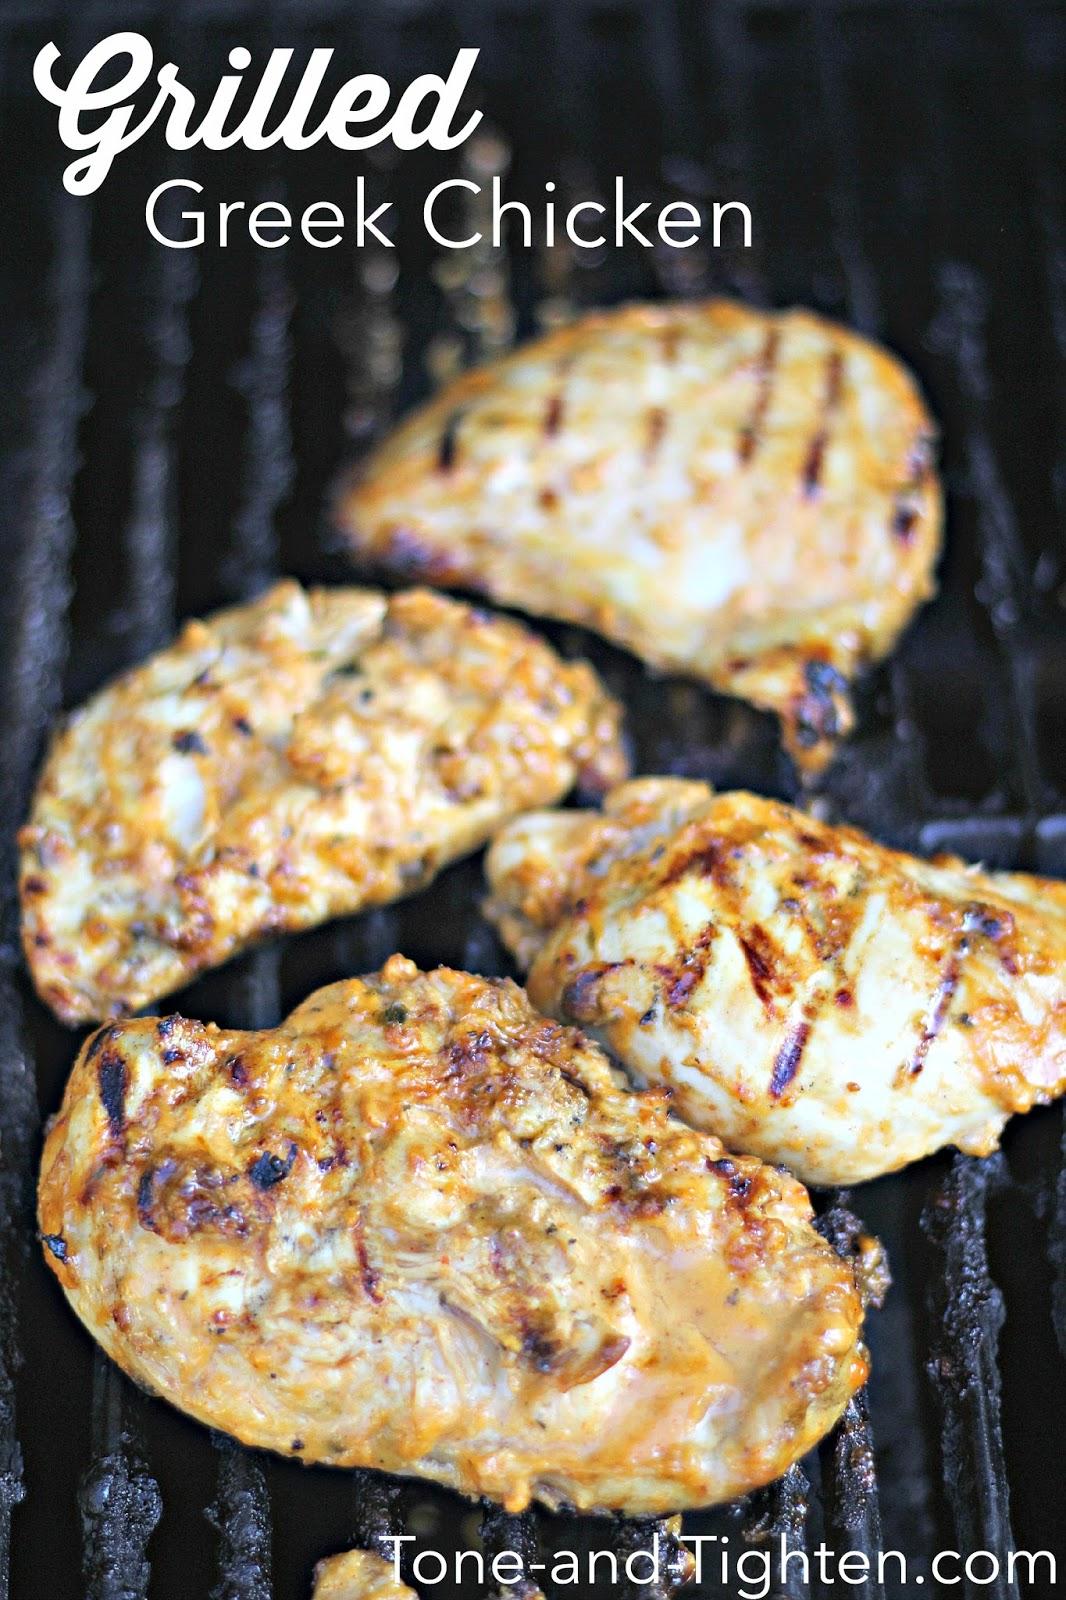 Grilled Greek Chicken Breast Recipe | Tone and Tighten